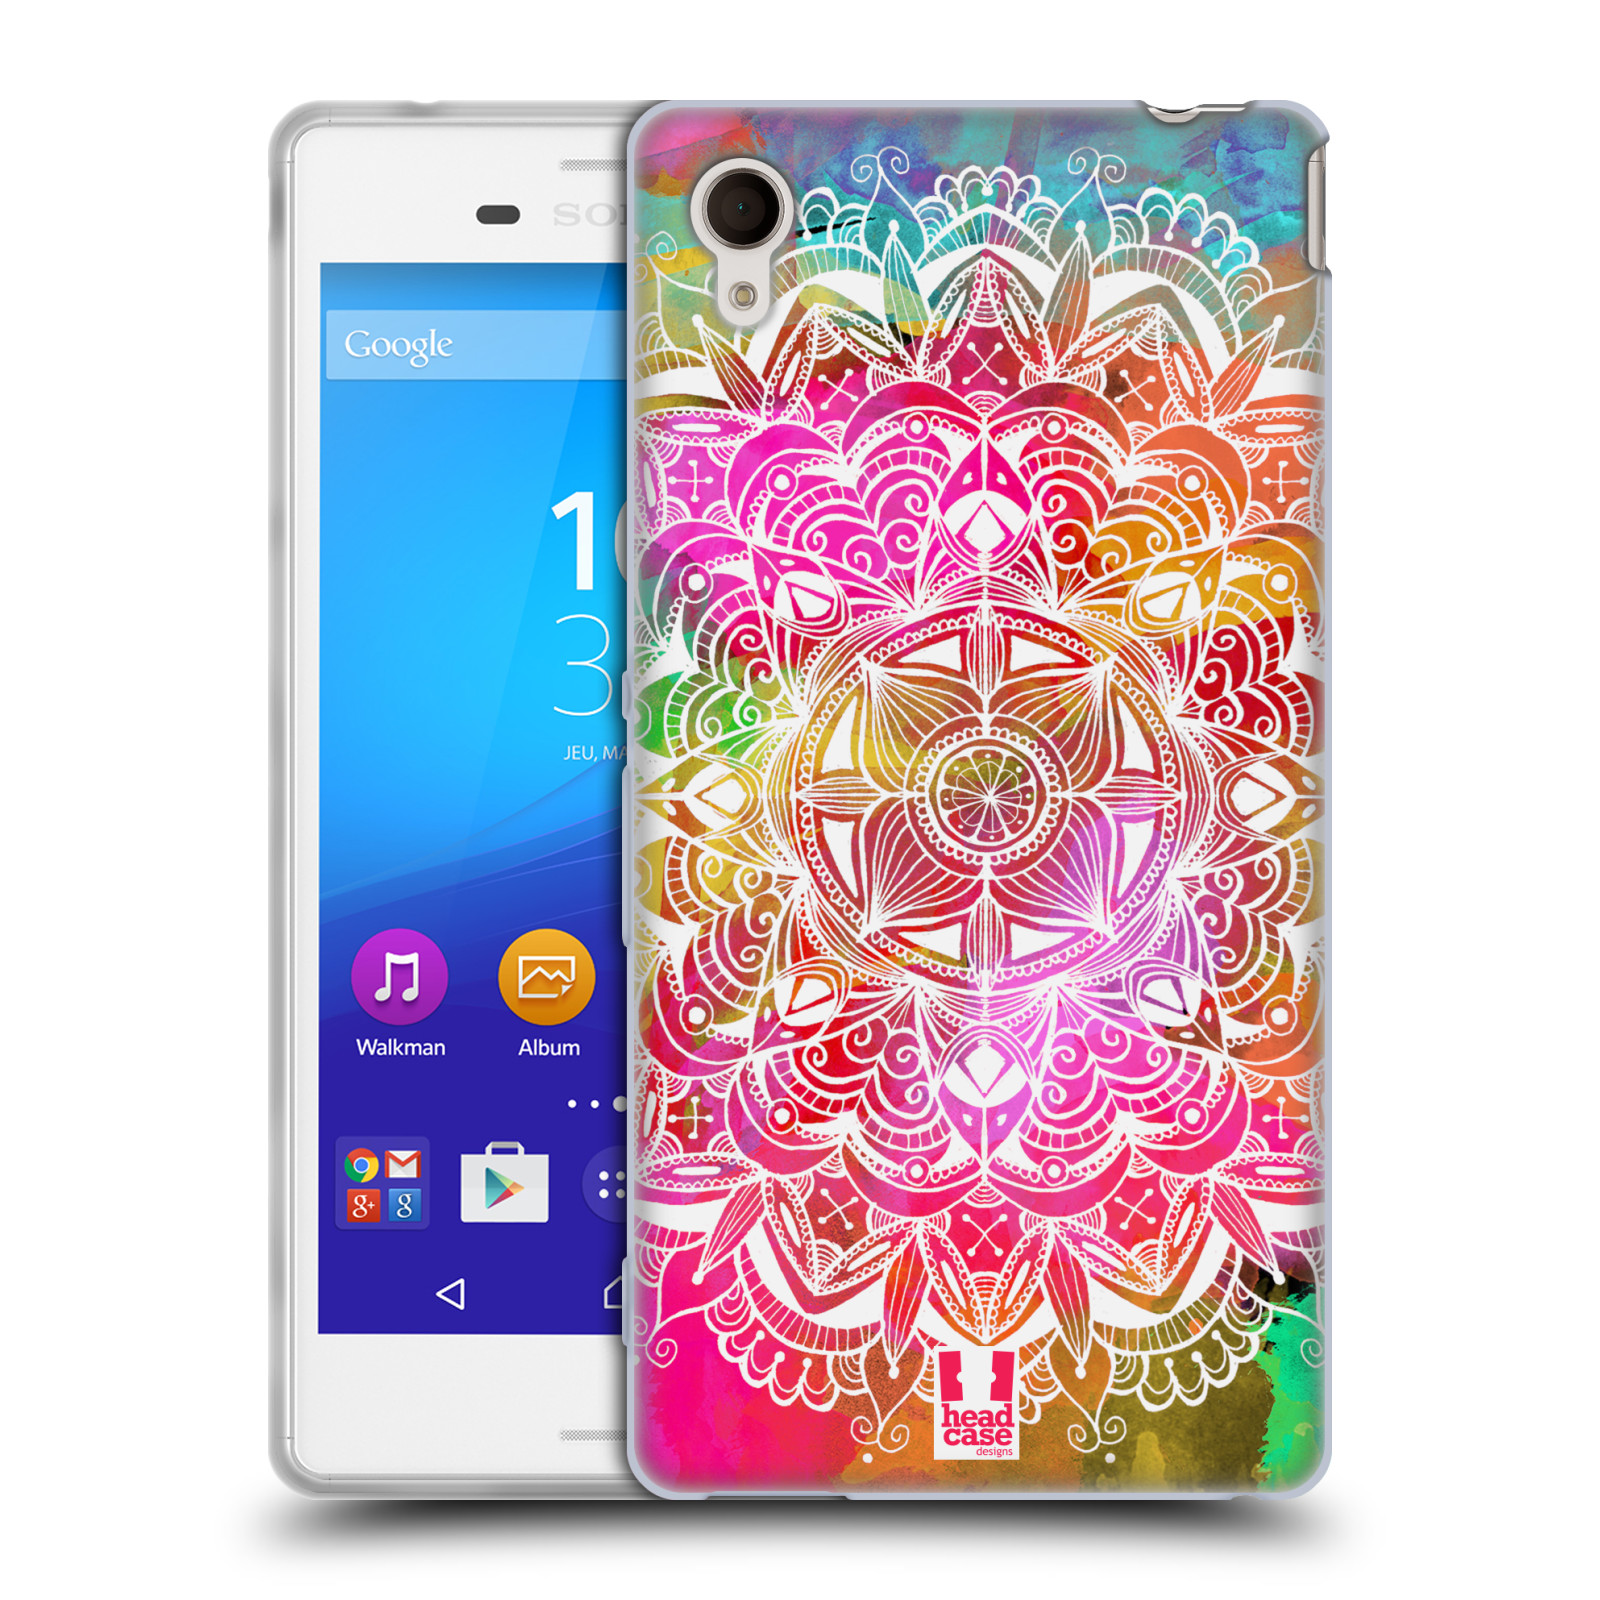 Silikonové pouzdro na mobil Sony Xperia M4 Aqua E2303 HEAD CASE Mandala Doodle Watercolour (Silikonový kryt či obal na mobilní telefon Sony Xperia M4 Aqua a M4 Aqua Dual SIM)